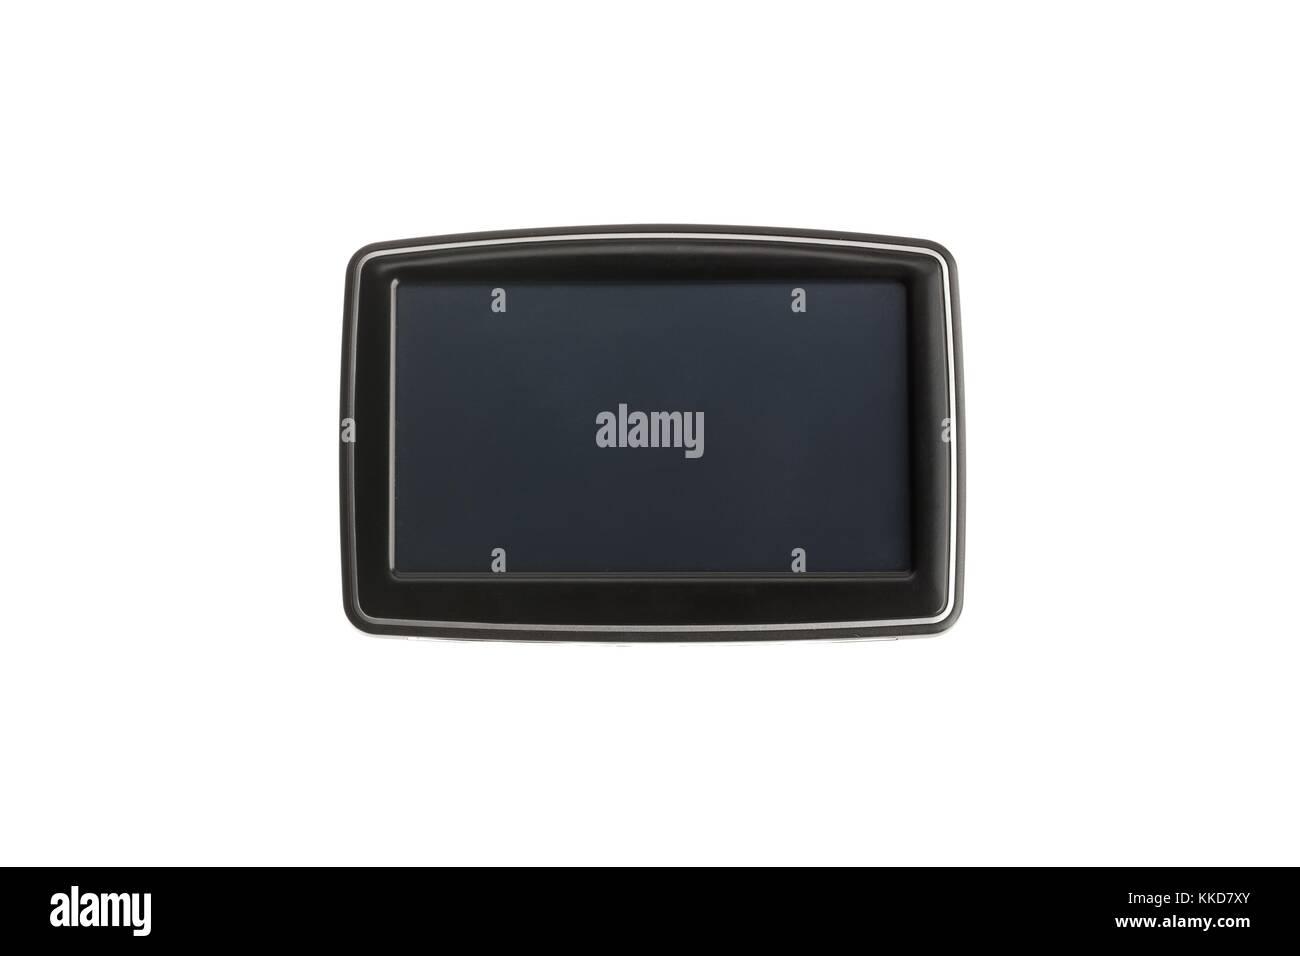 car gps navigation display - Stock Image